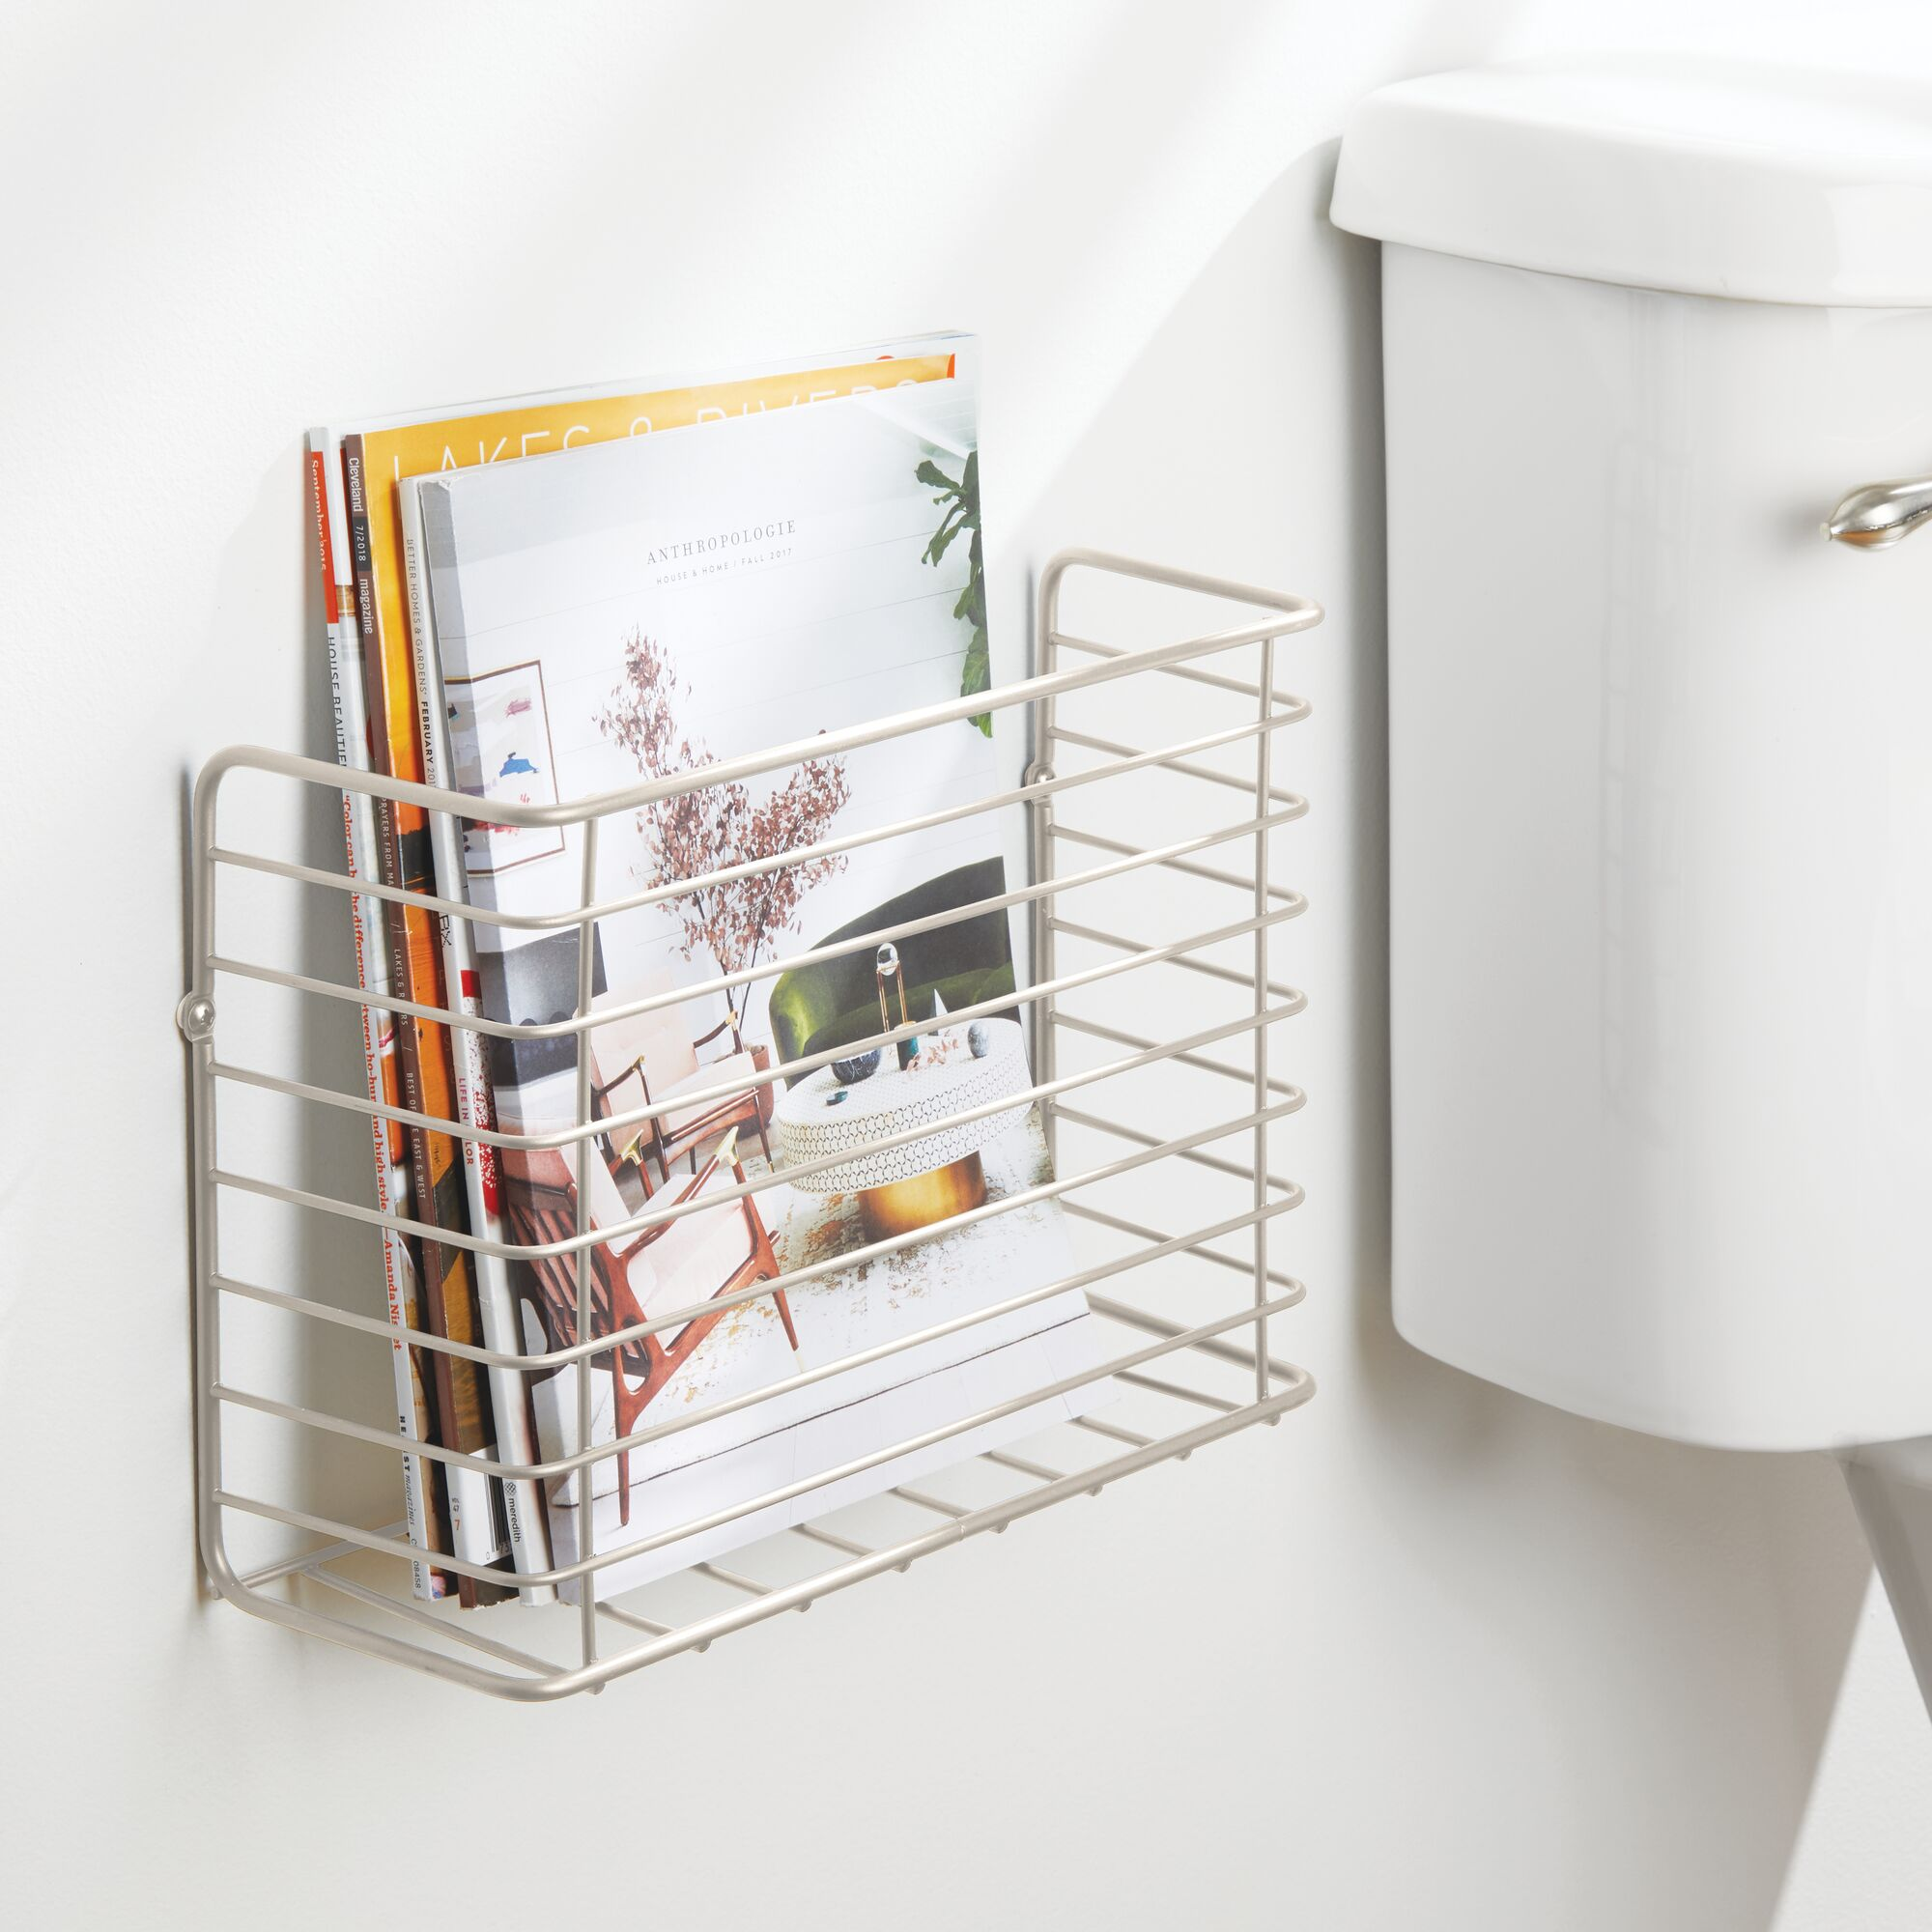 mDesign-Metal-Wall-Mount-Magazine-Holder-Storage-Organizer-Rack thumbnail 53